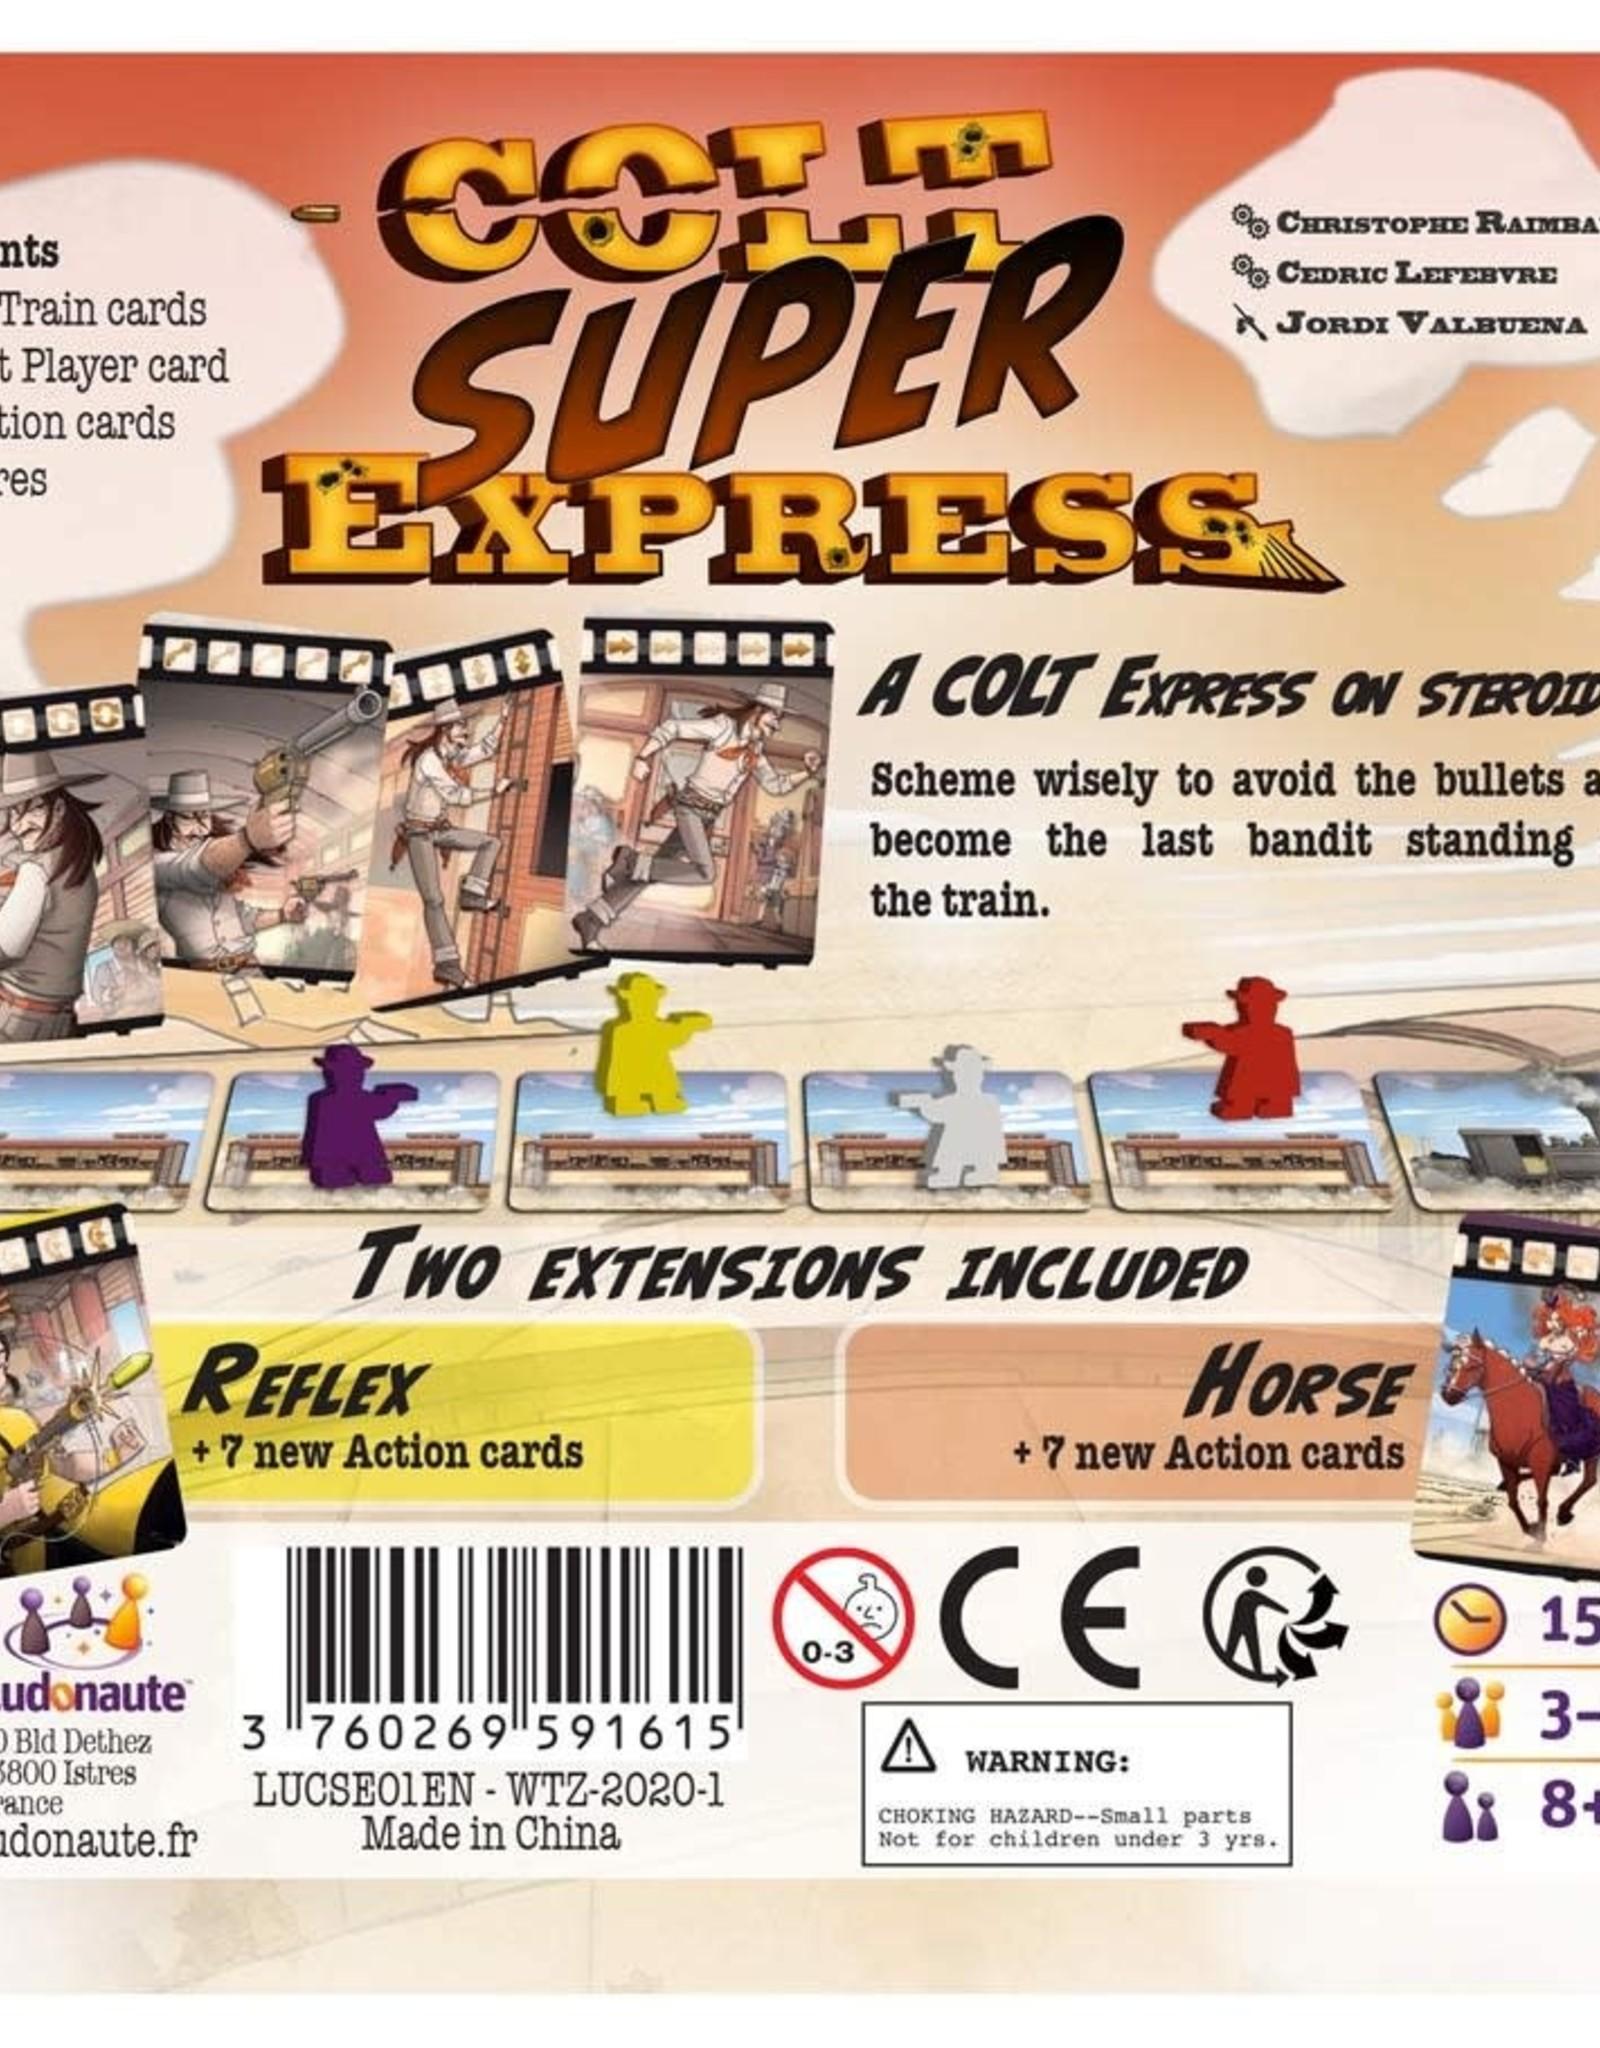 Ludonaute Super Colt Express